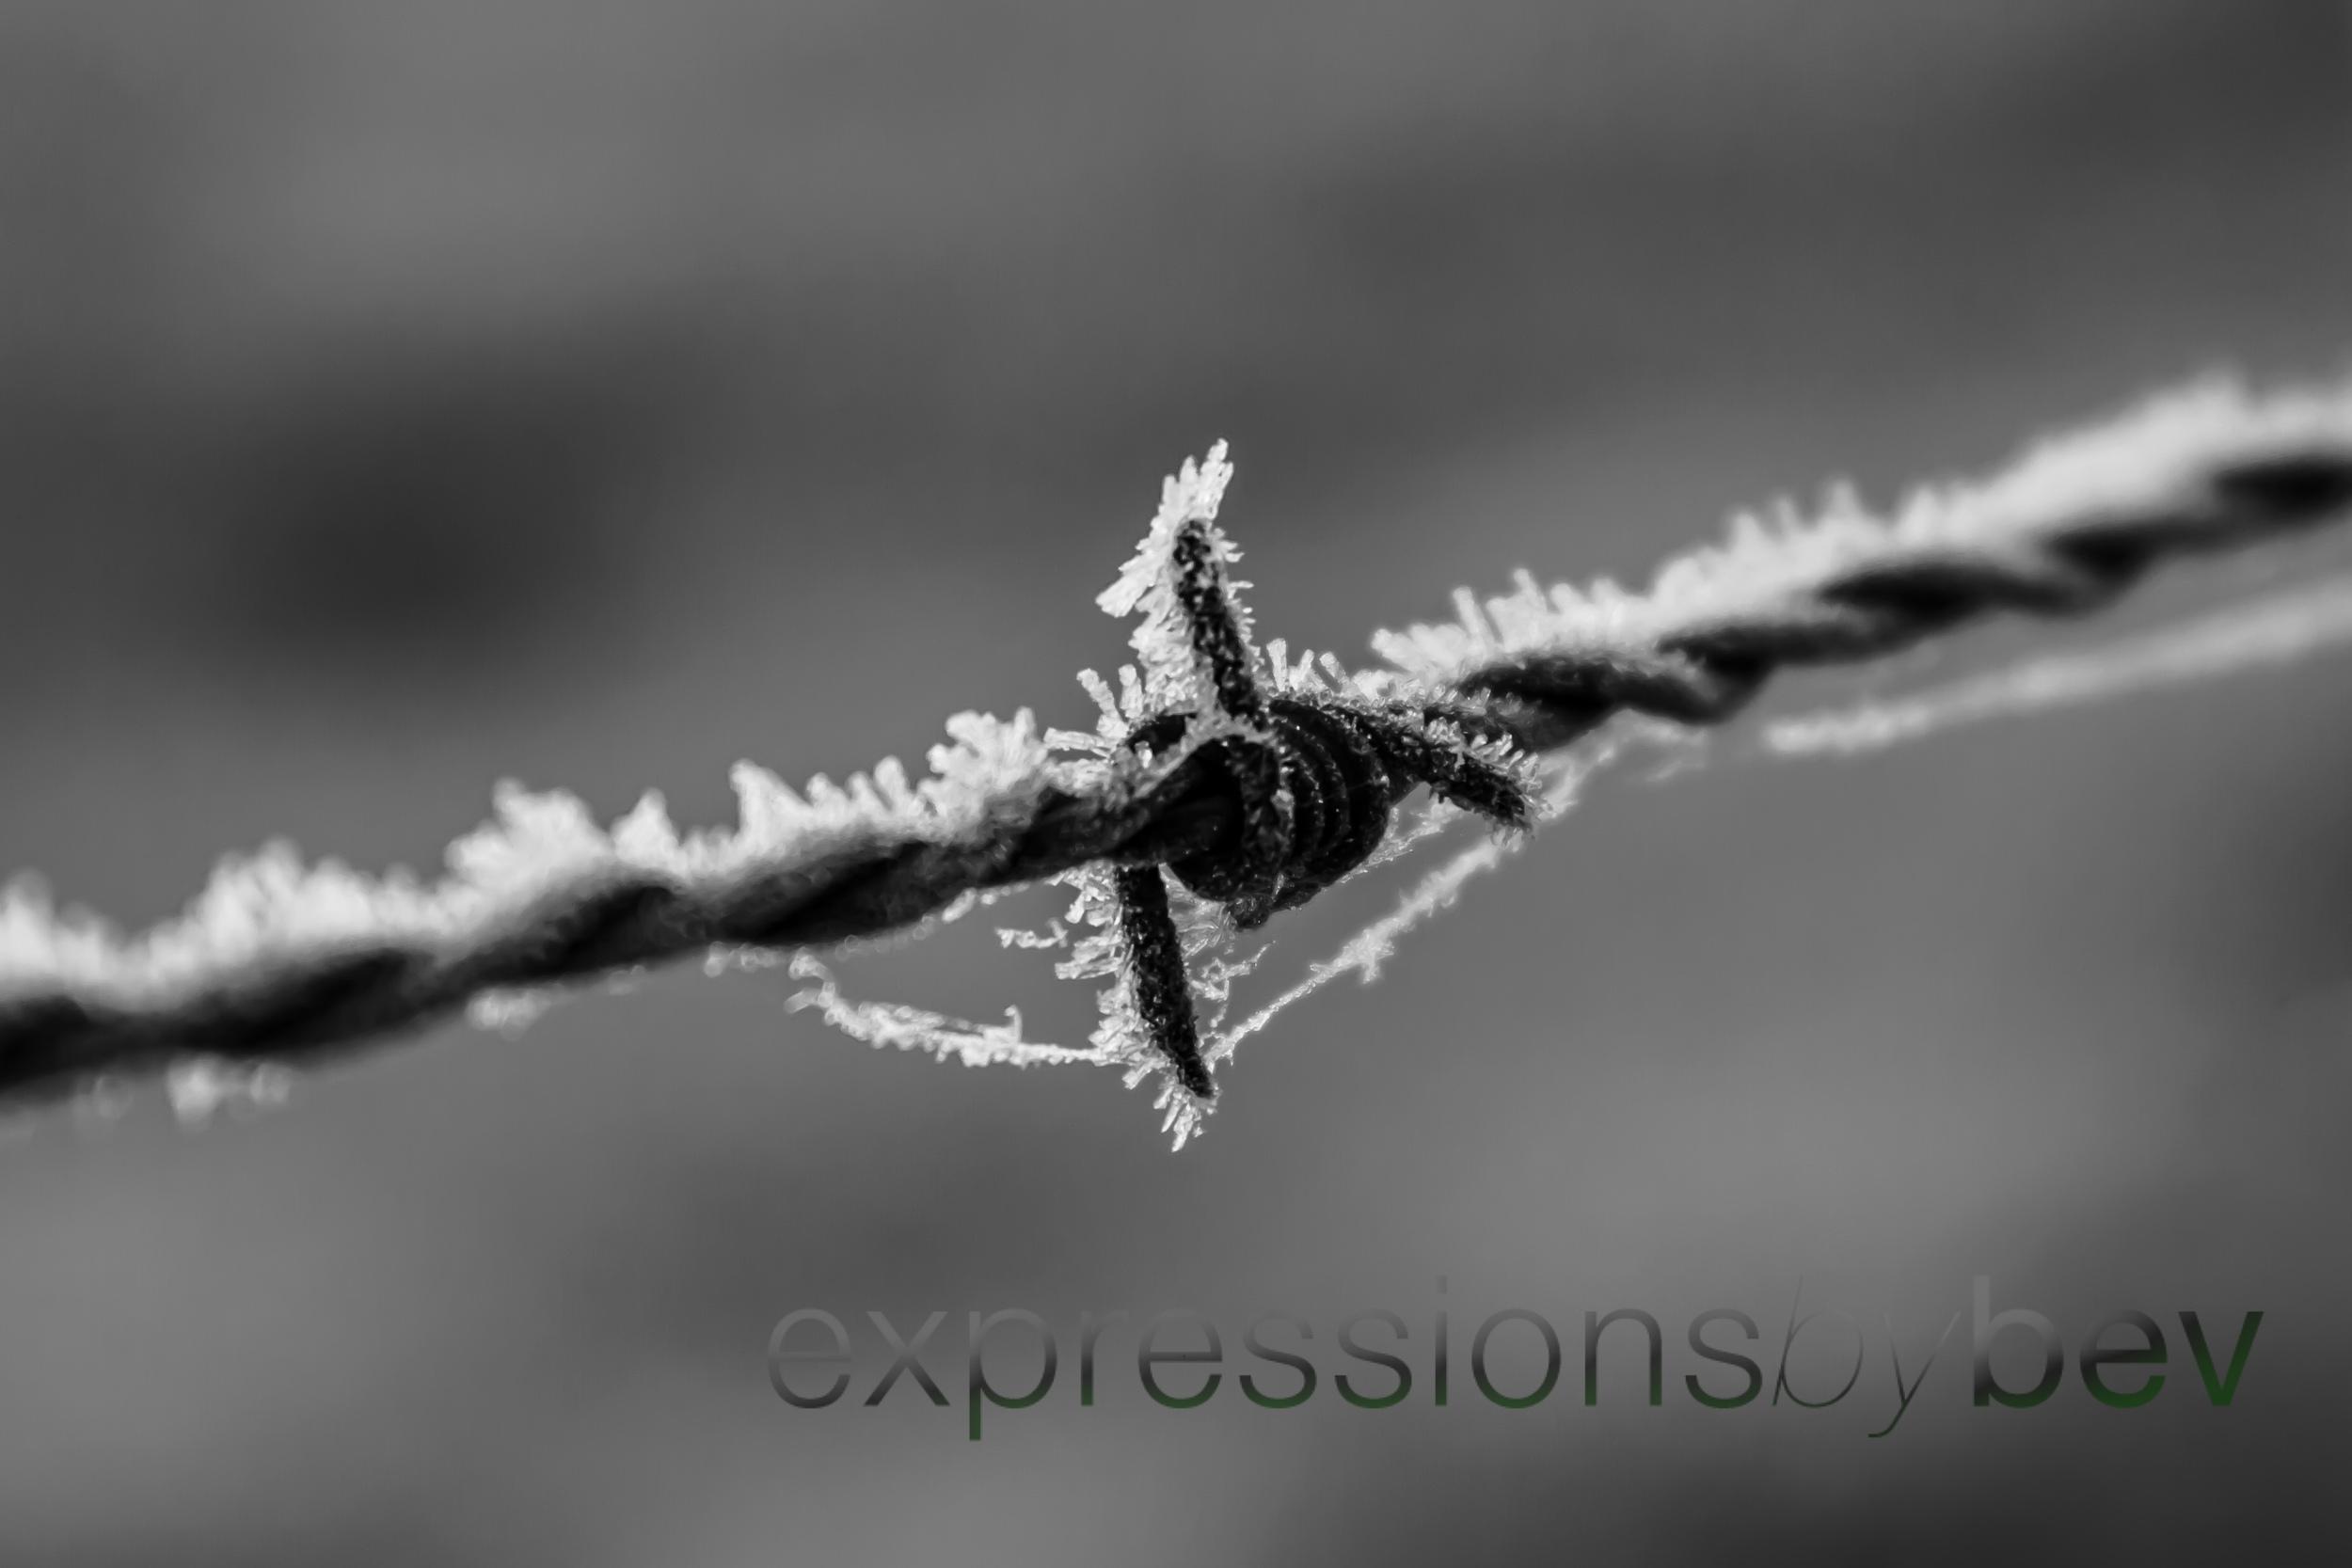 EBBev-2013-CNPA cades cove,treemont,roaring fork,sunrise,frost,spiderwebs,-3488-10_-56.jpg